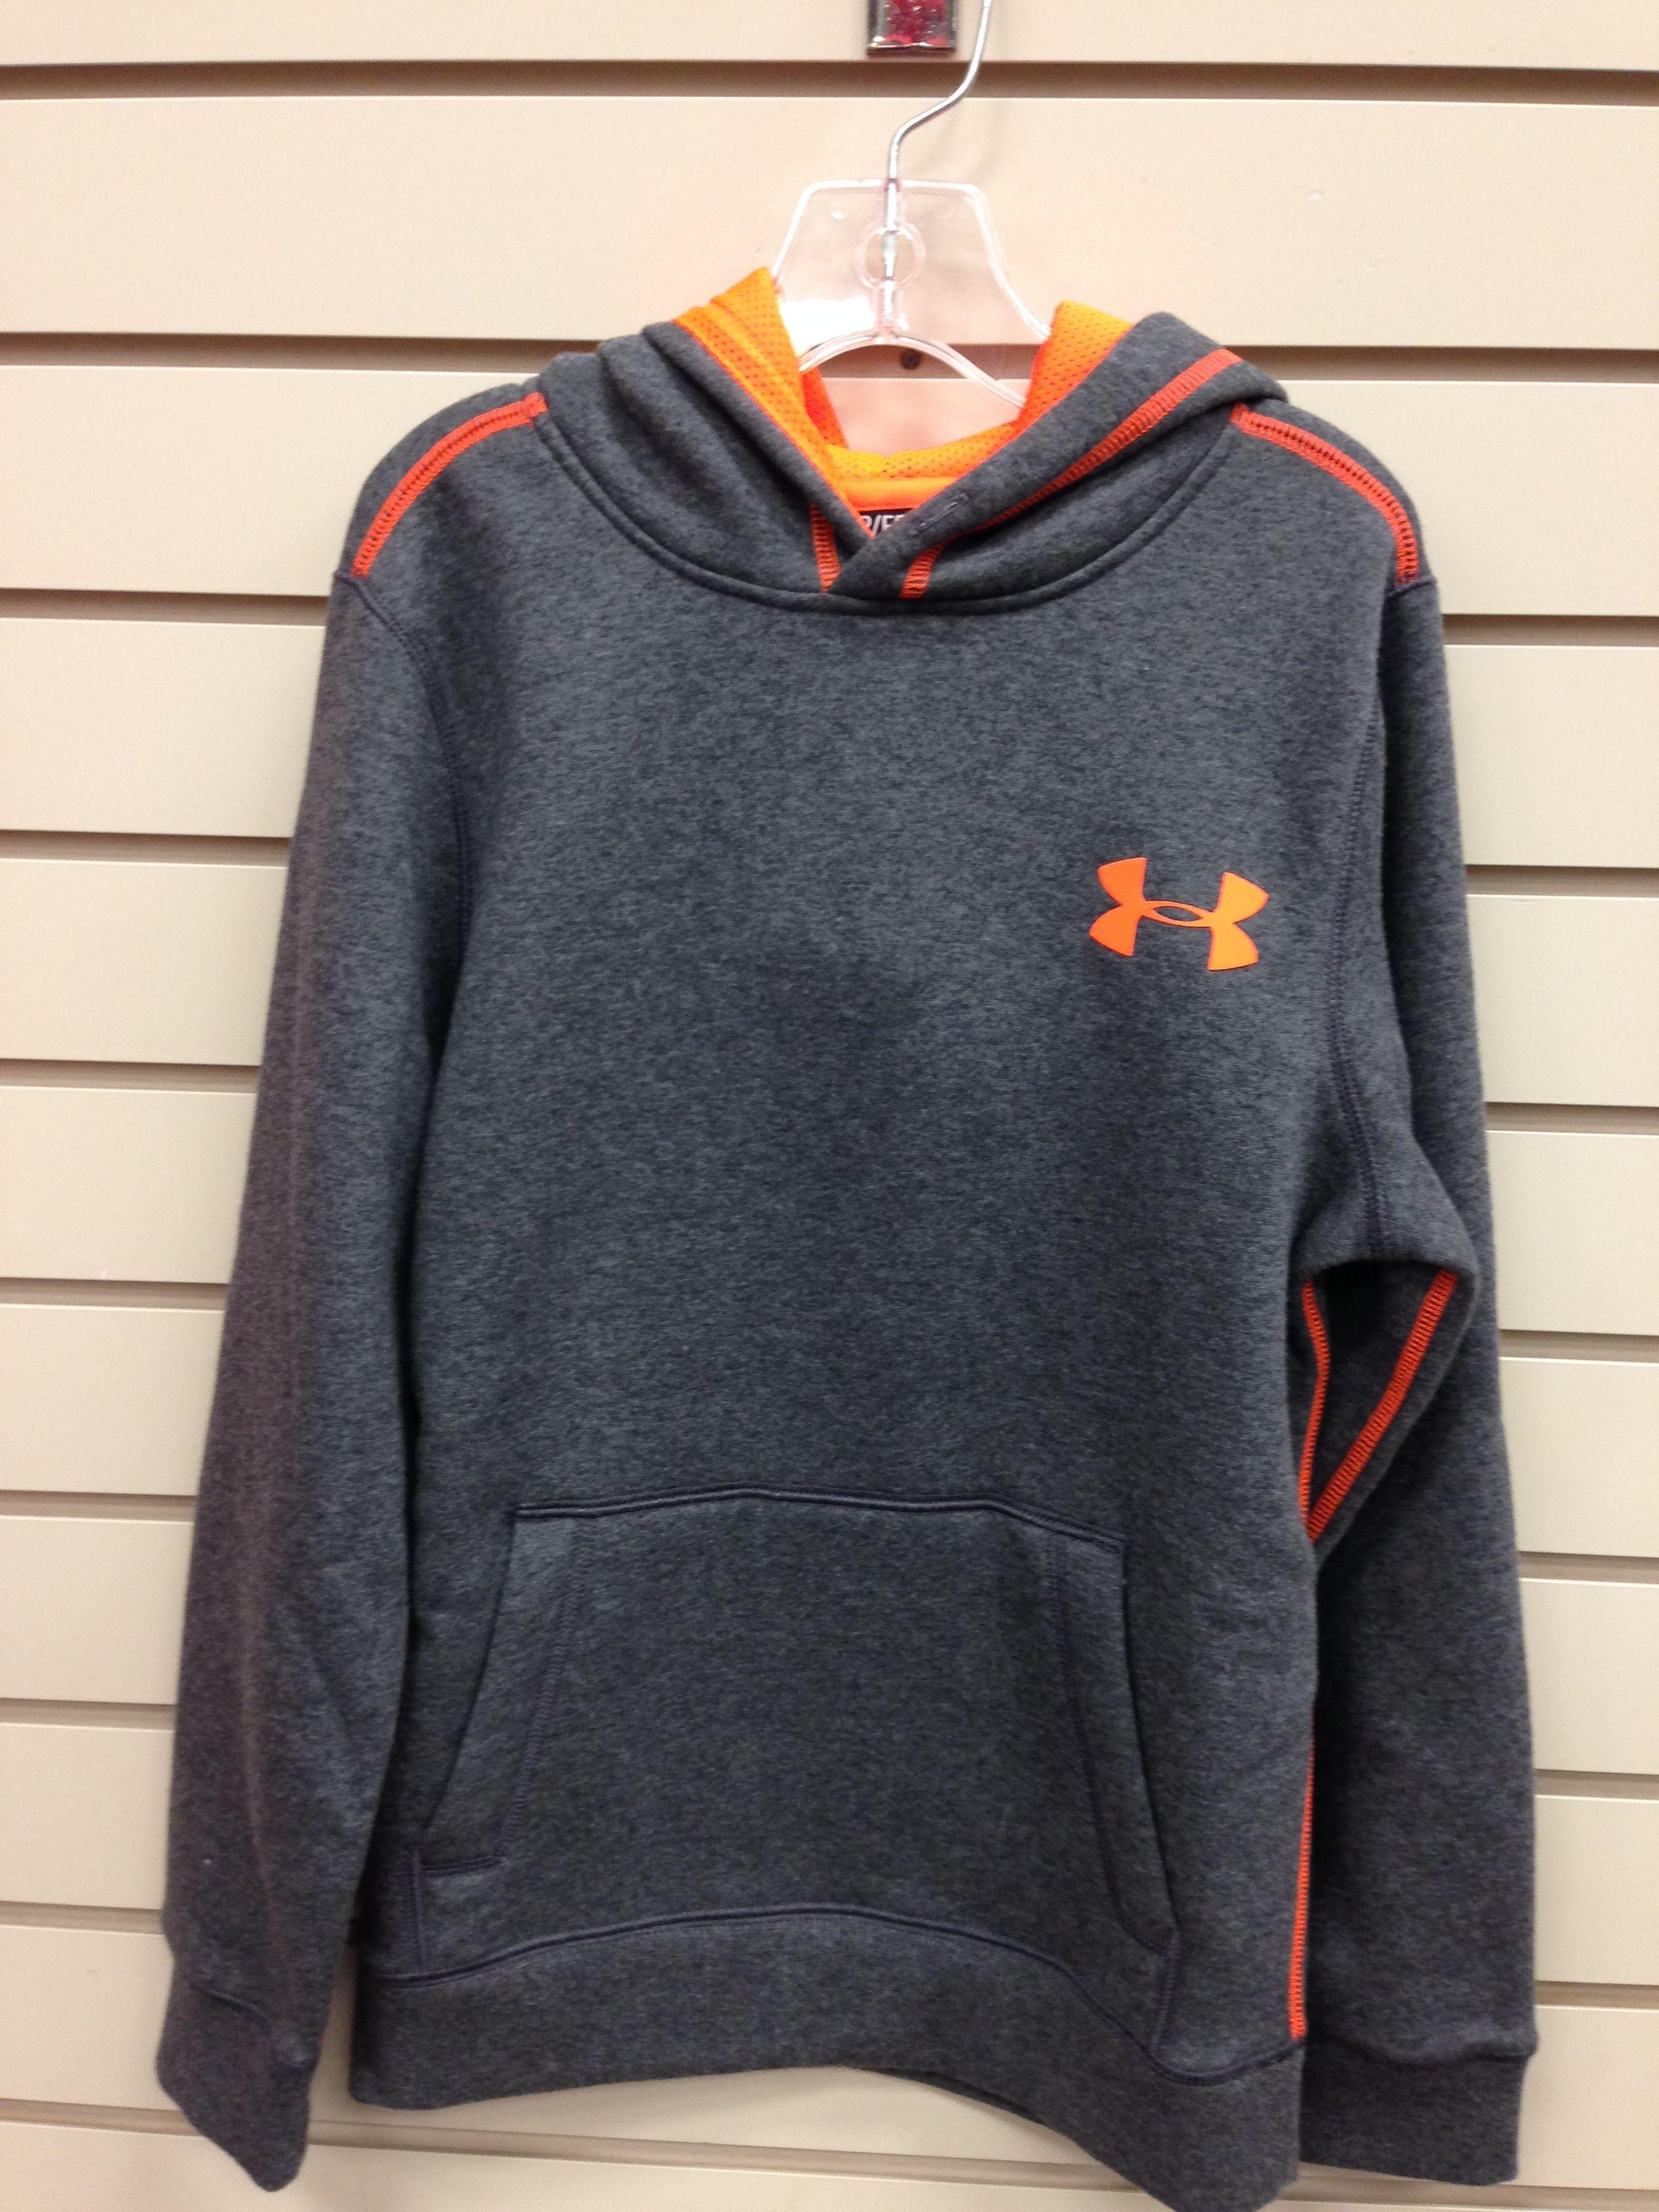 Youth Under Armour Sweatshirt, Gray and Orange Kids